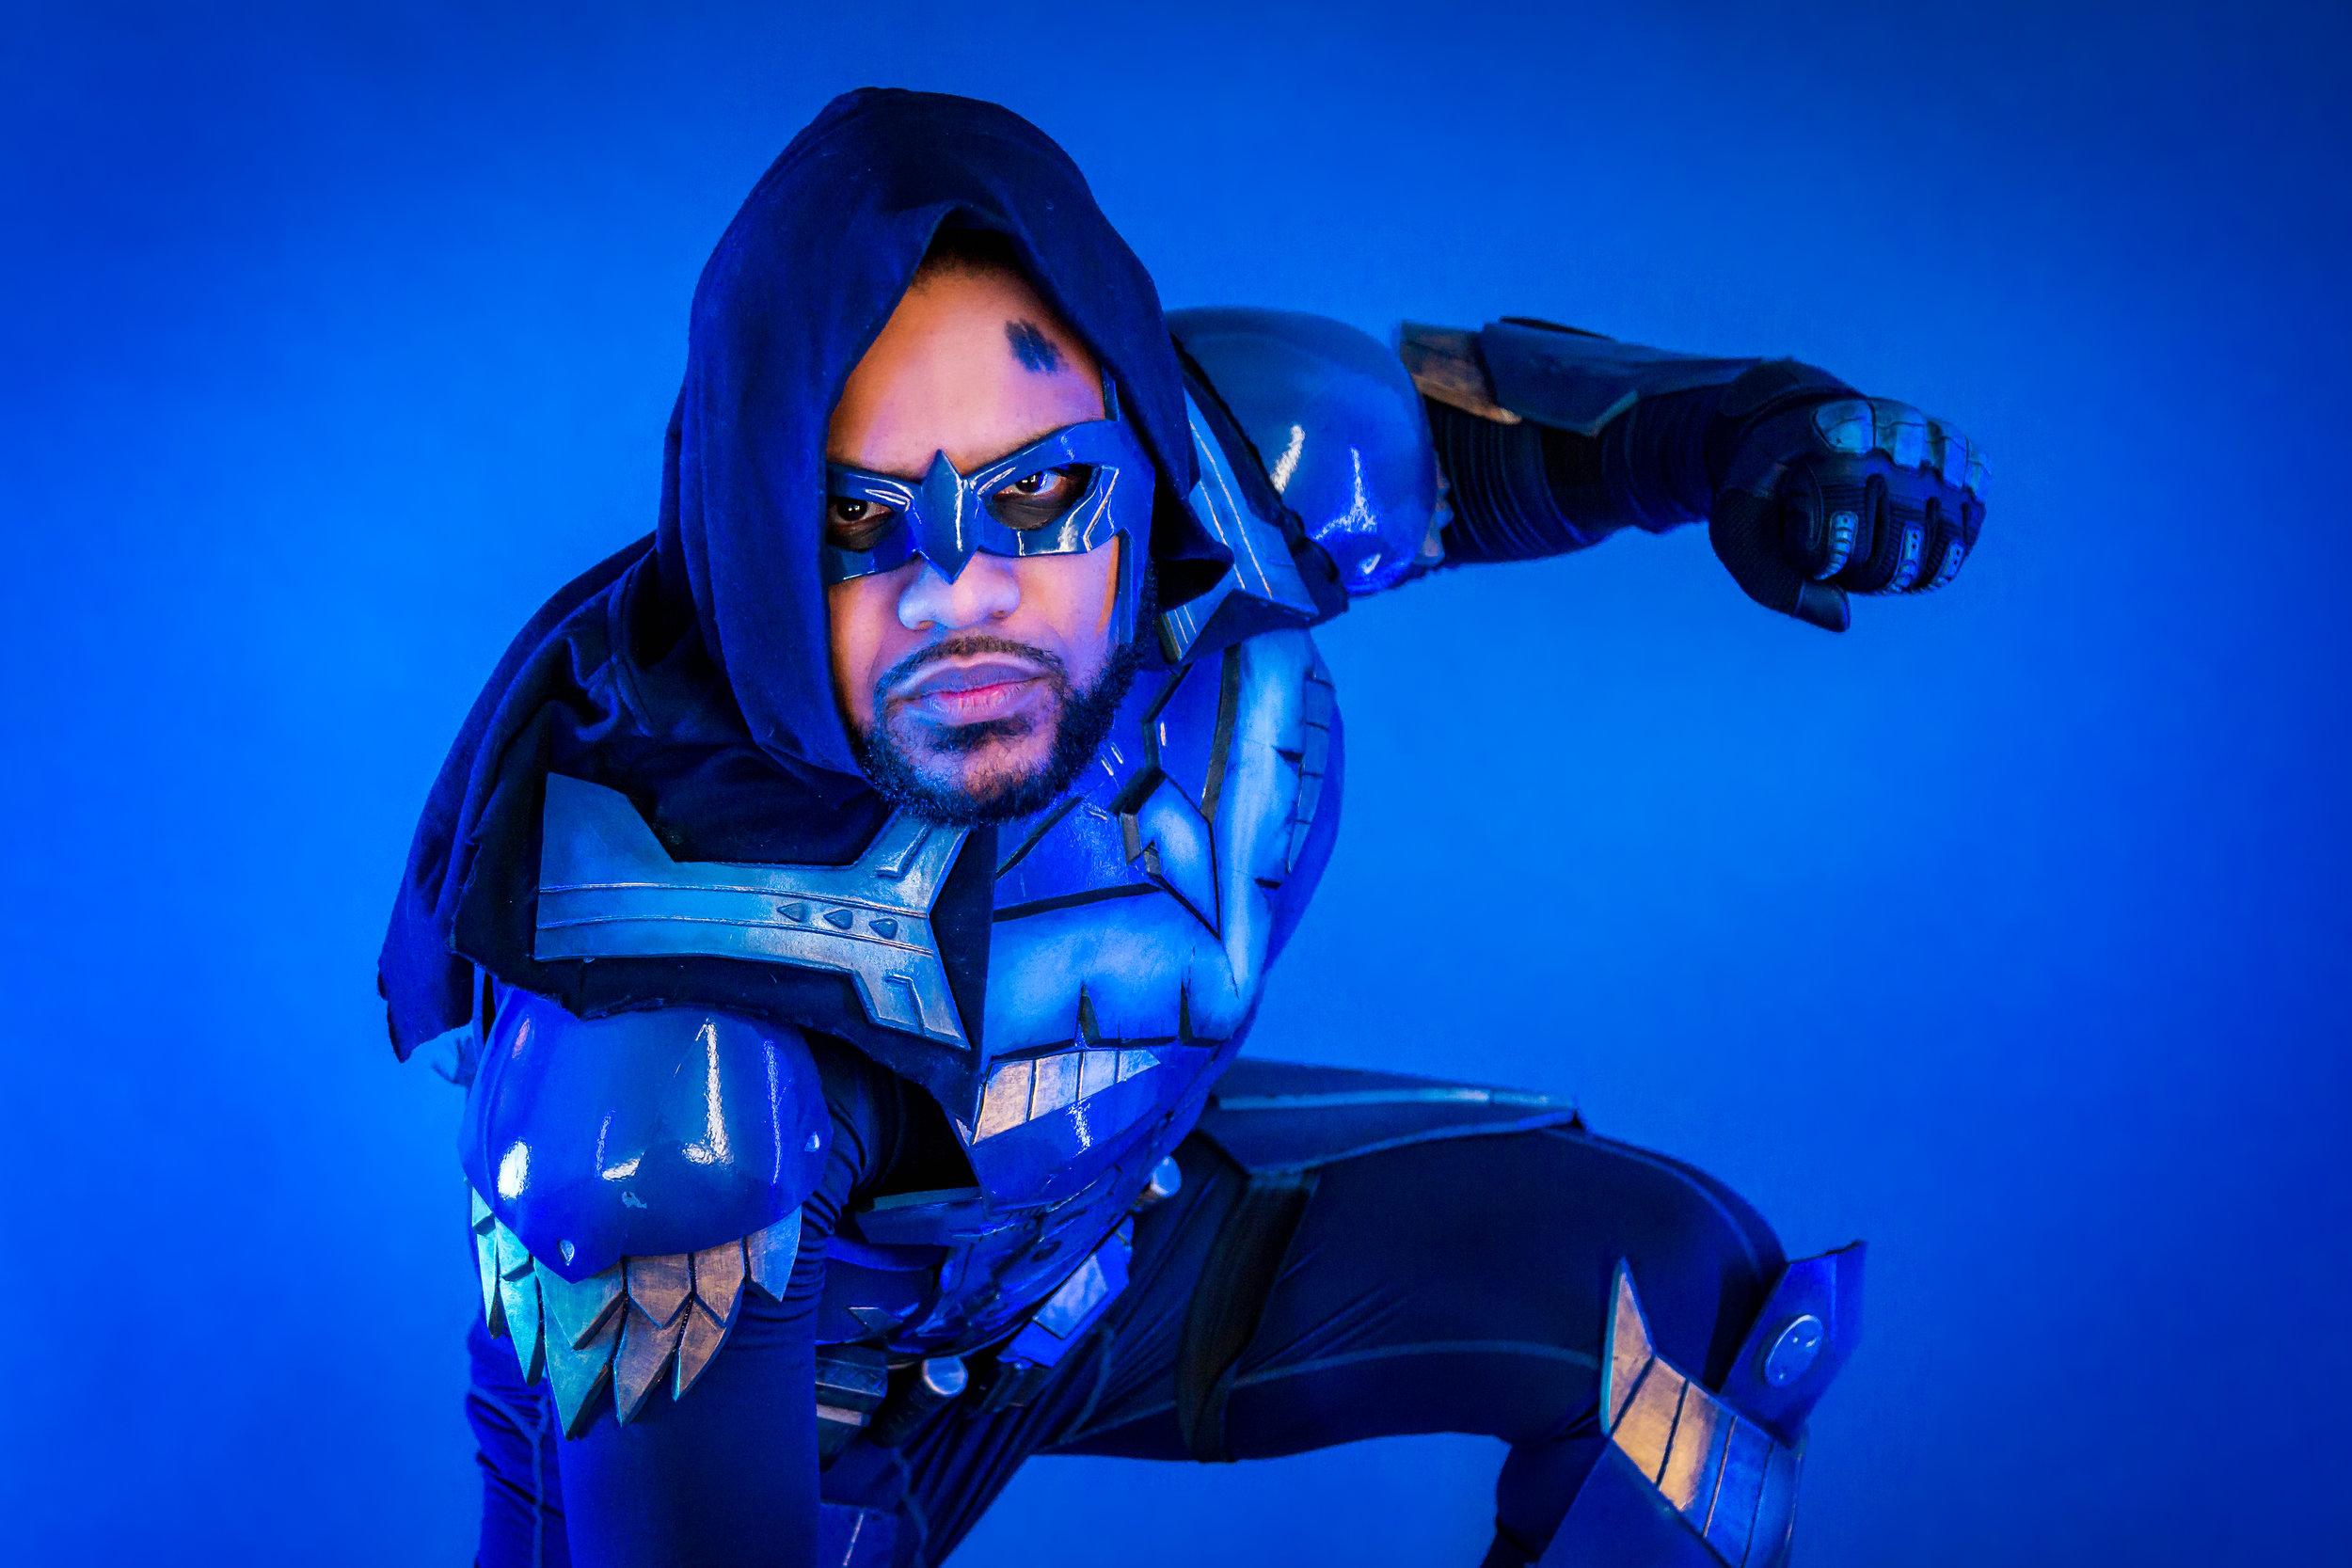 Nightwing_H24-Edit.jpg